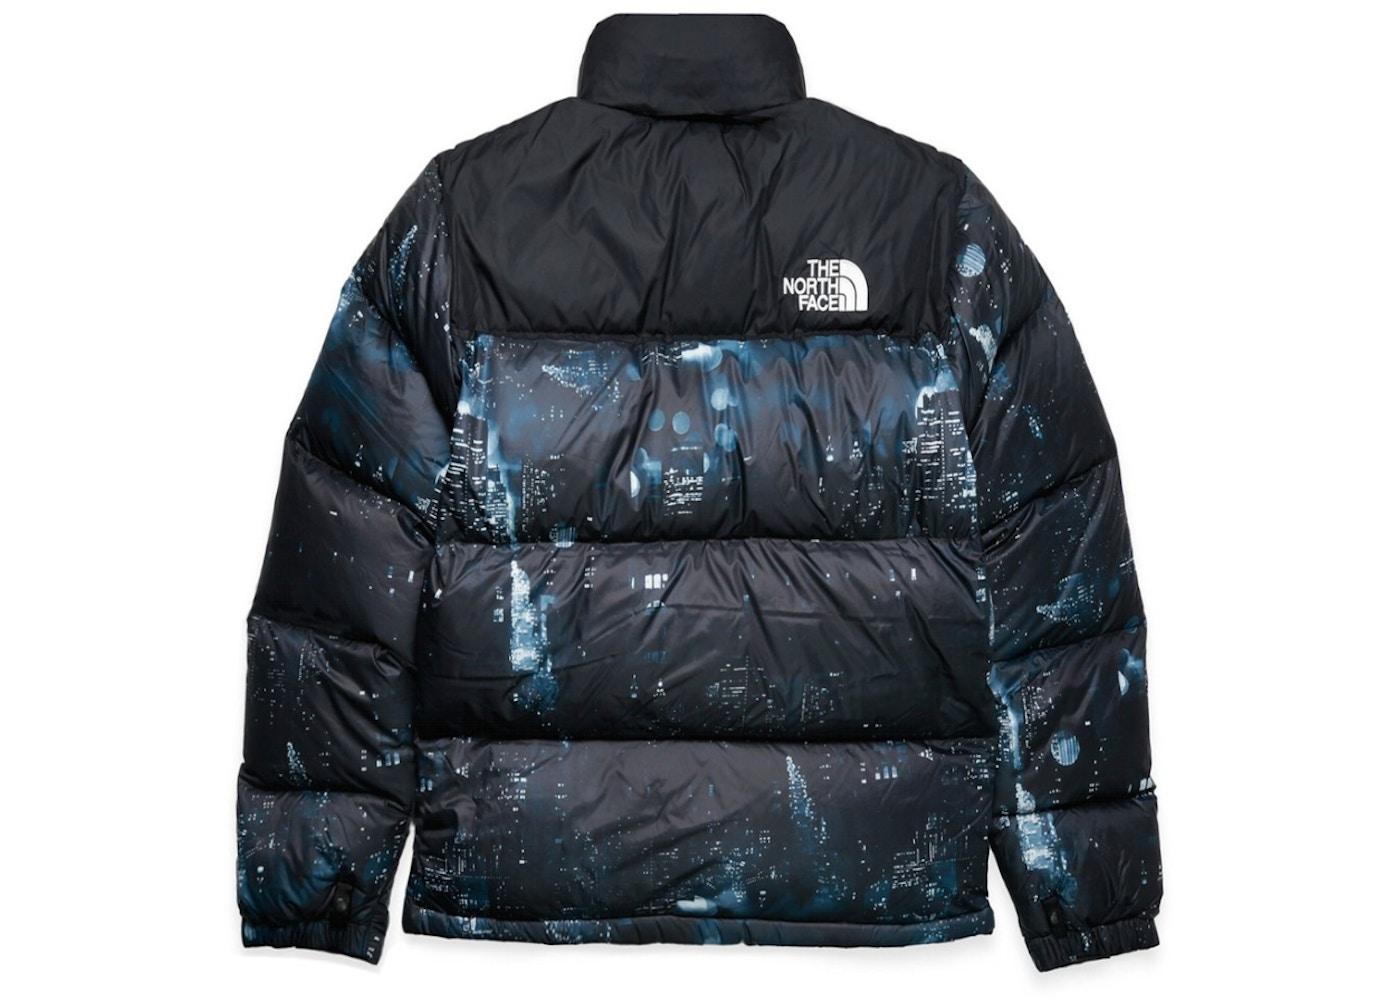 83a0345412 Buy   Sell Other Brands Streetwear - Last Sale